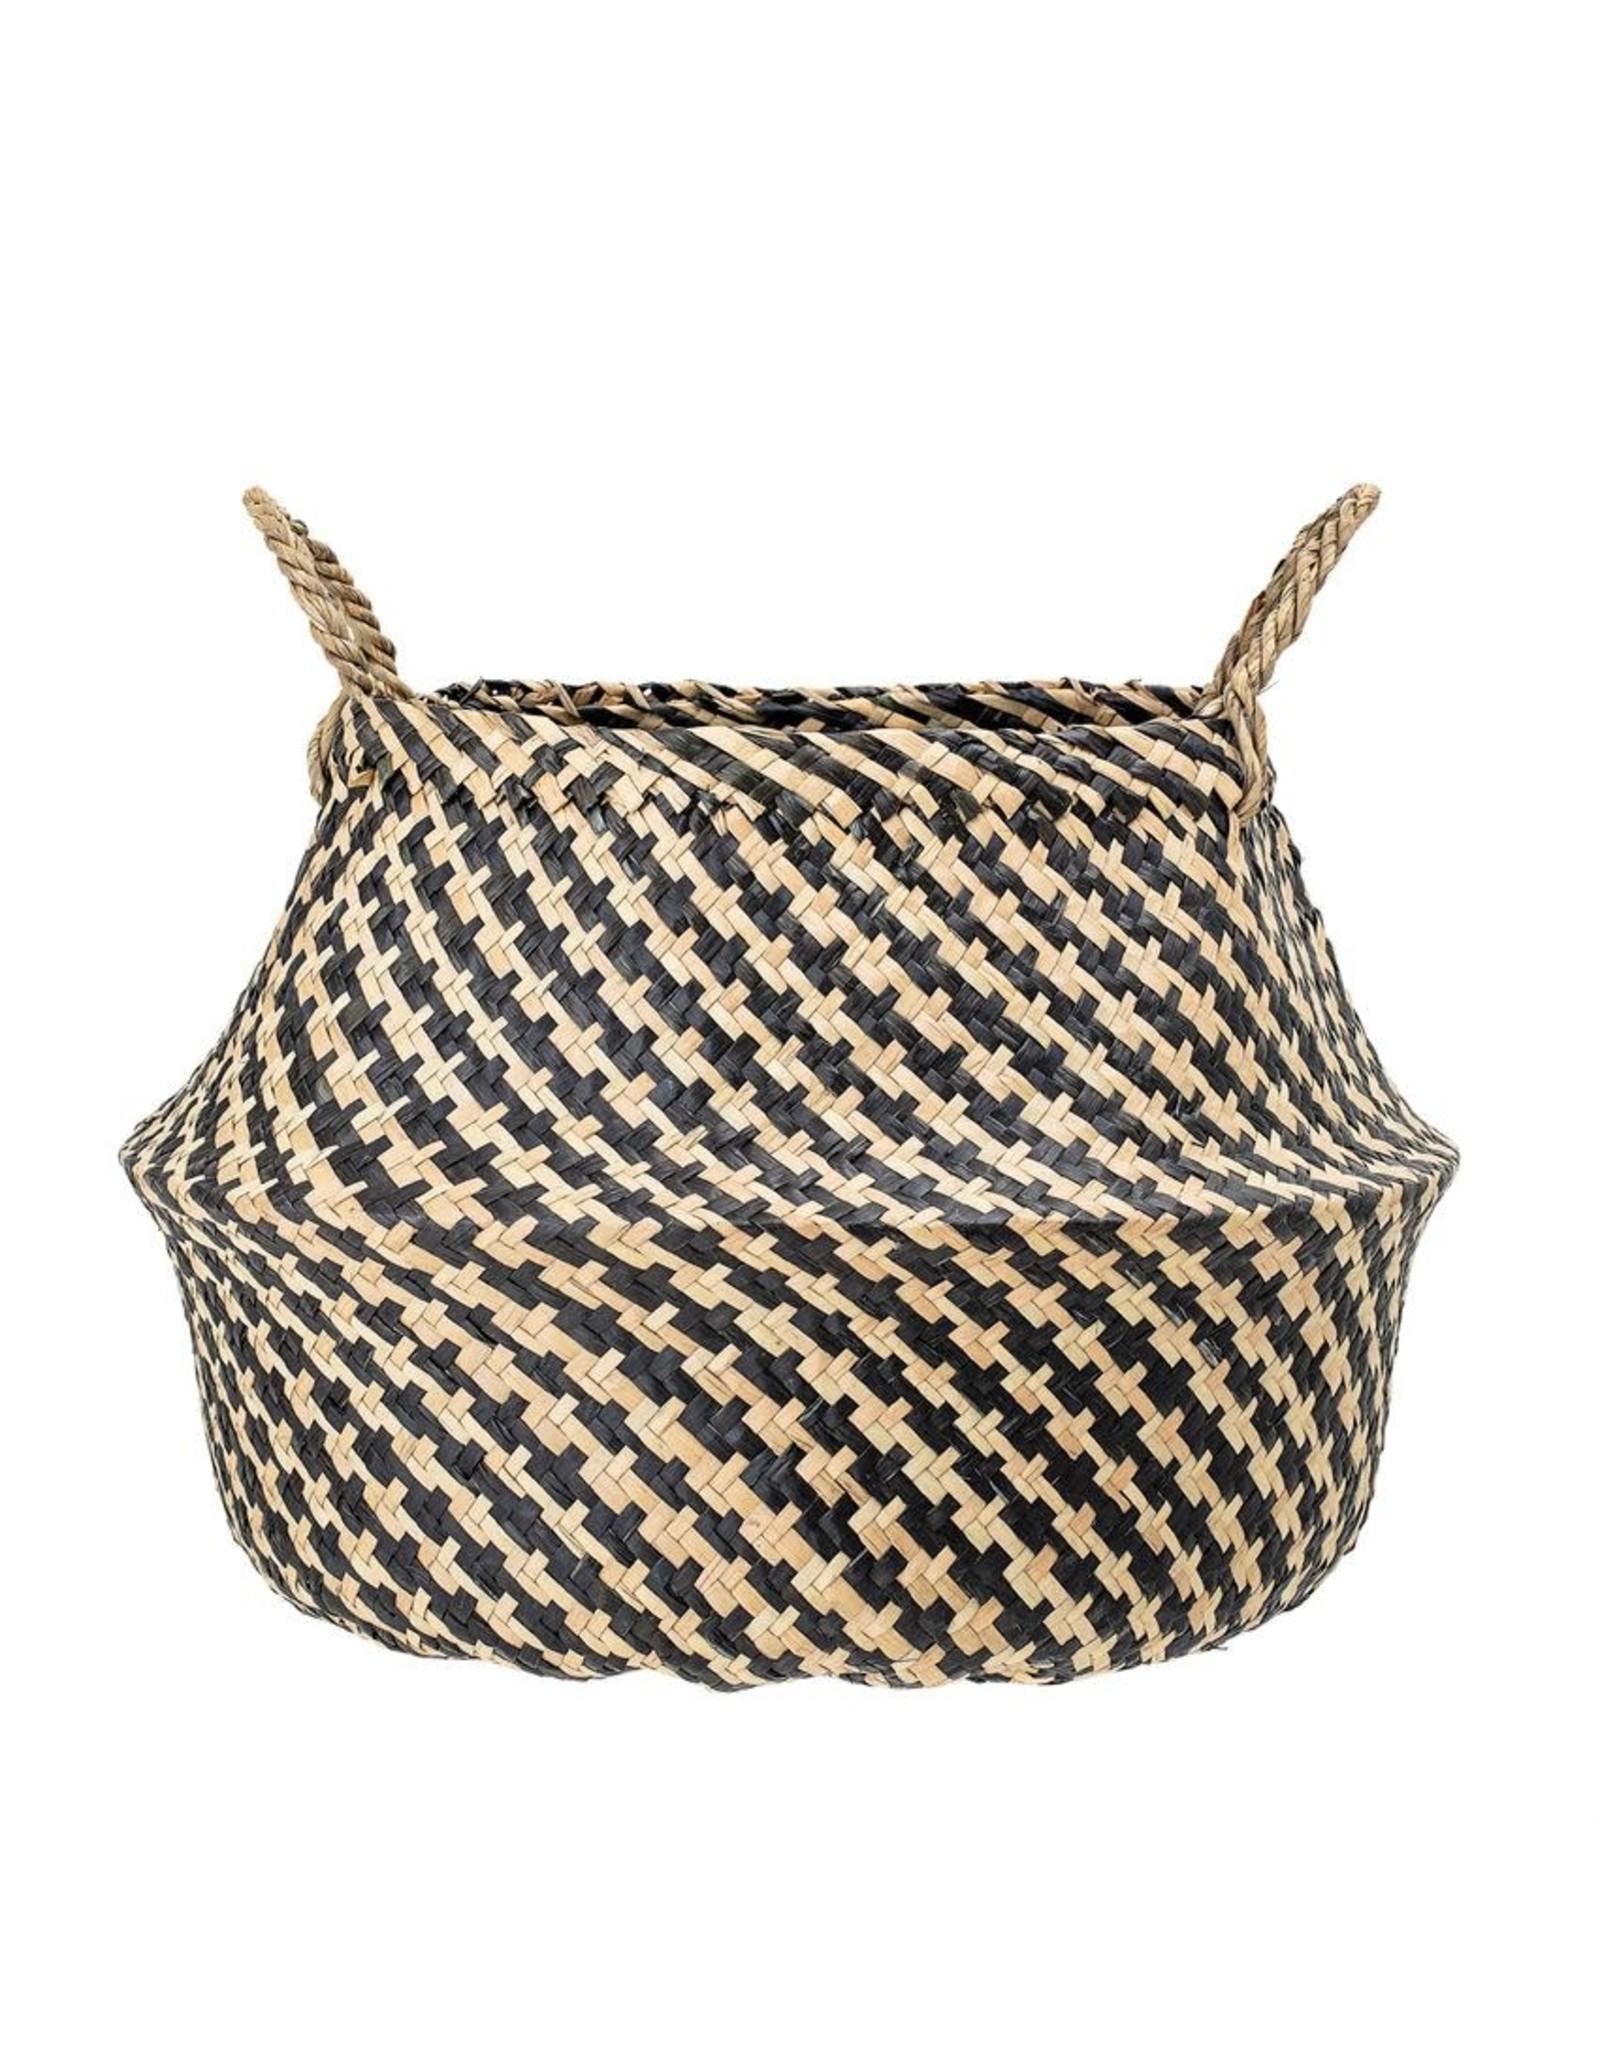 Website Natural Seagrass Houndstooth Basket w/ Handles, Black & White